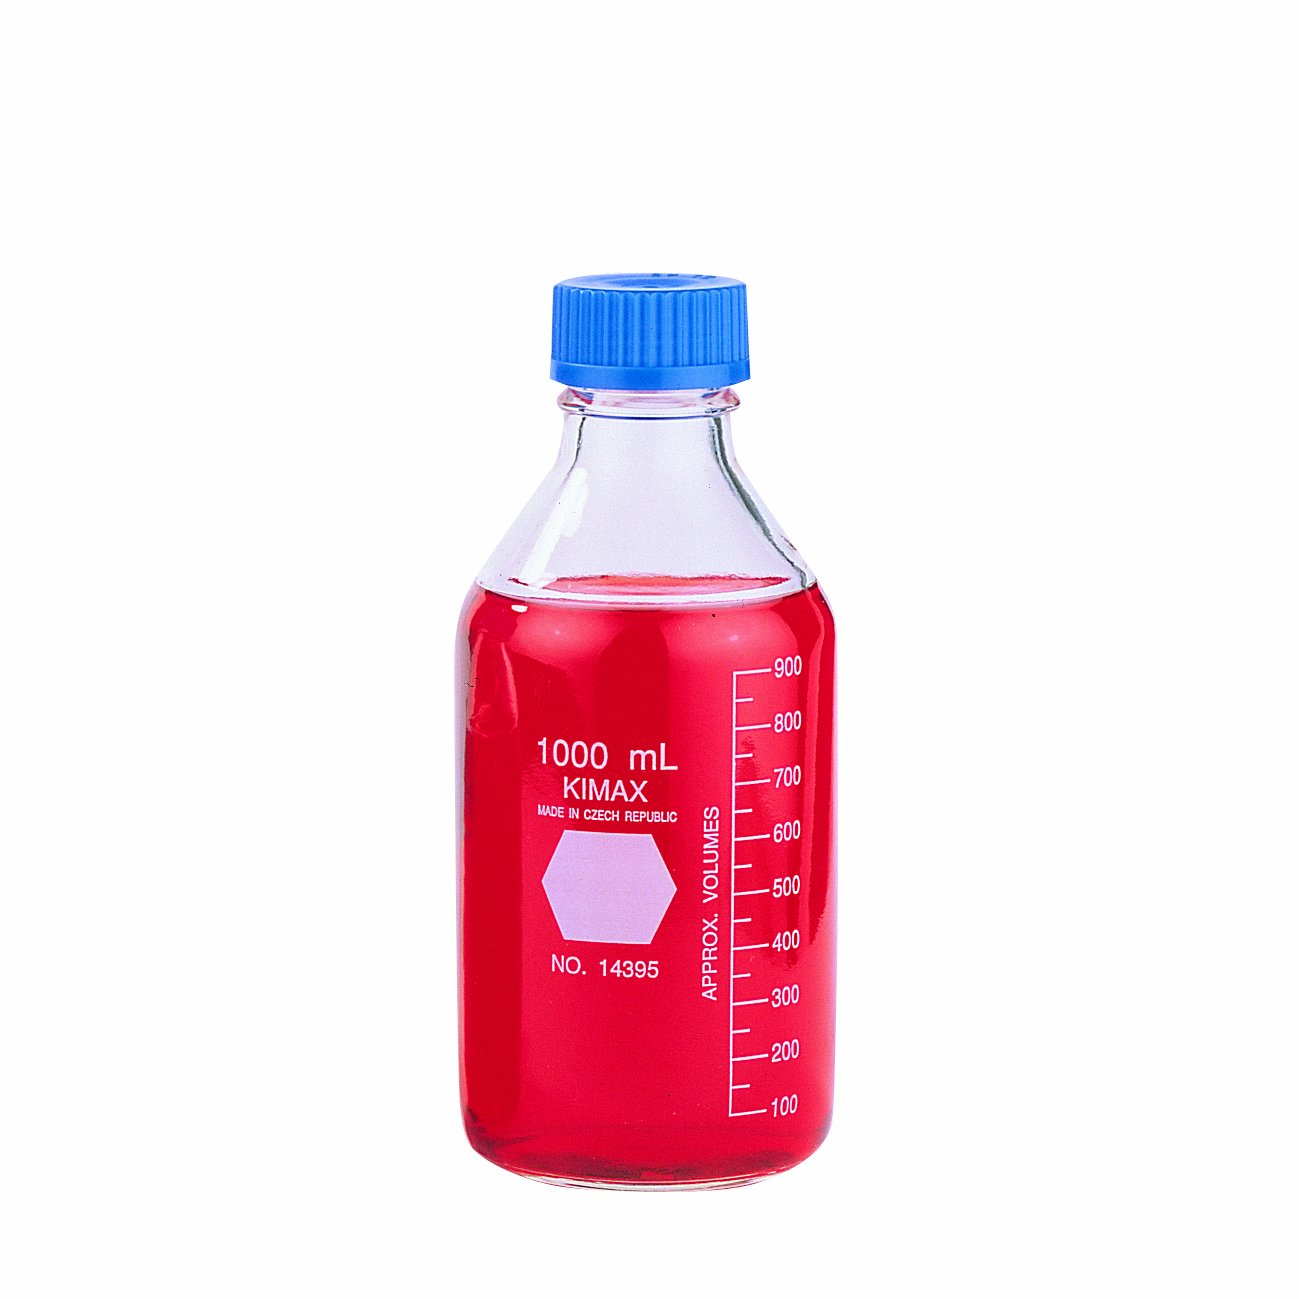 Kimble 14395-5000 Borosilicate Glass GL-45 Media/Storage Bottle With Blue Polypropylene Screw Thread Cap, 5 L by Kimble